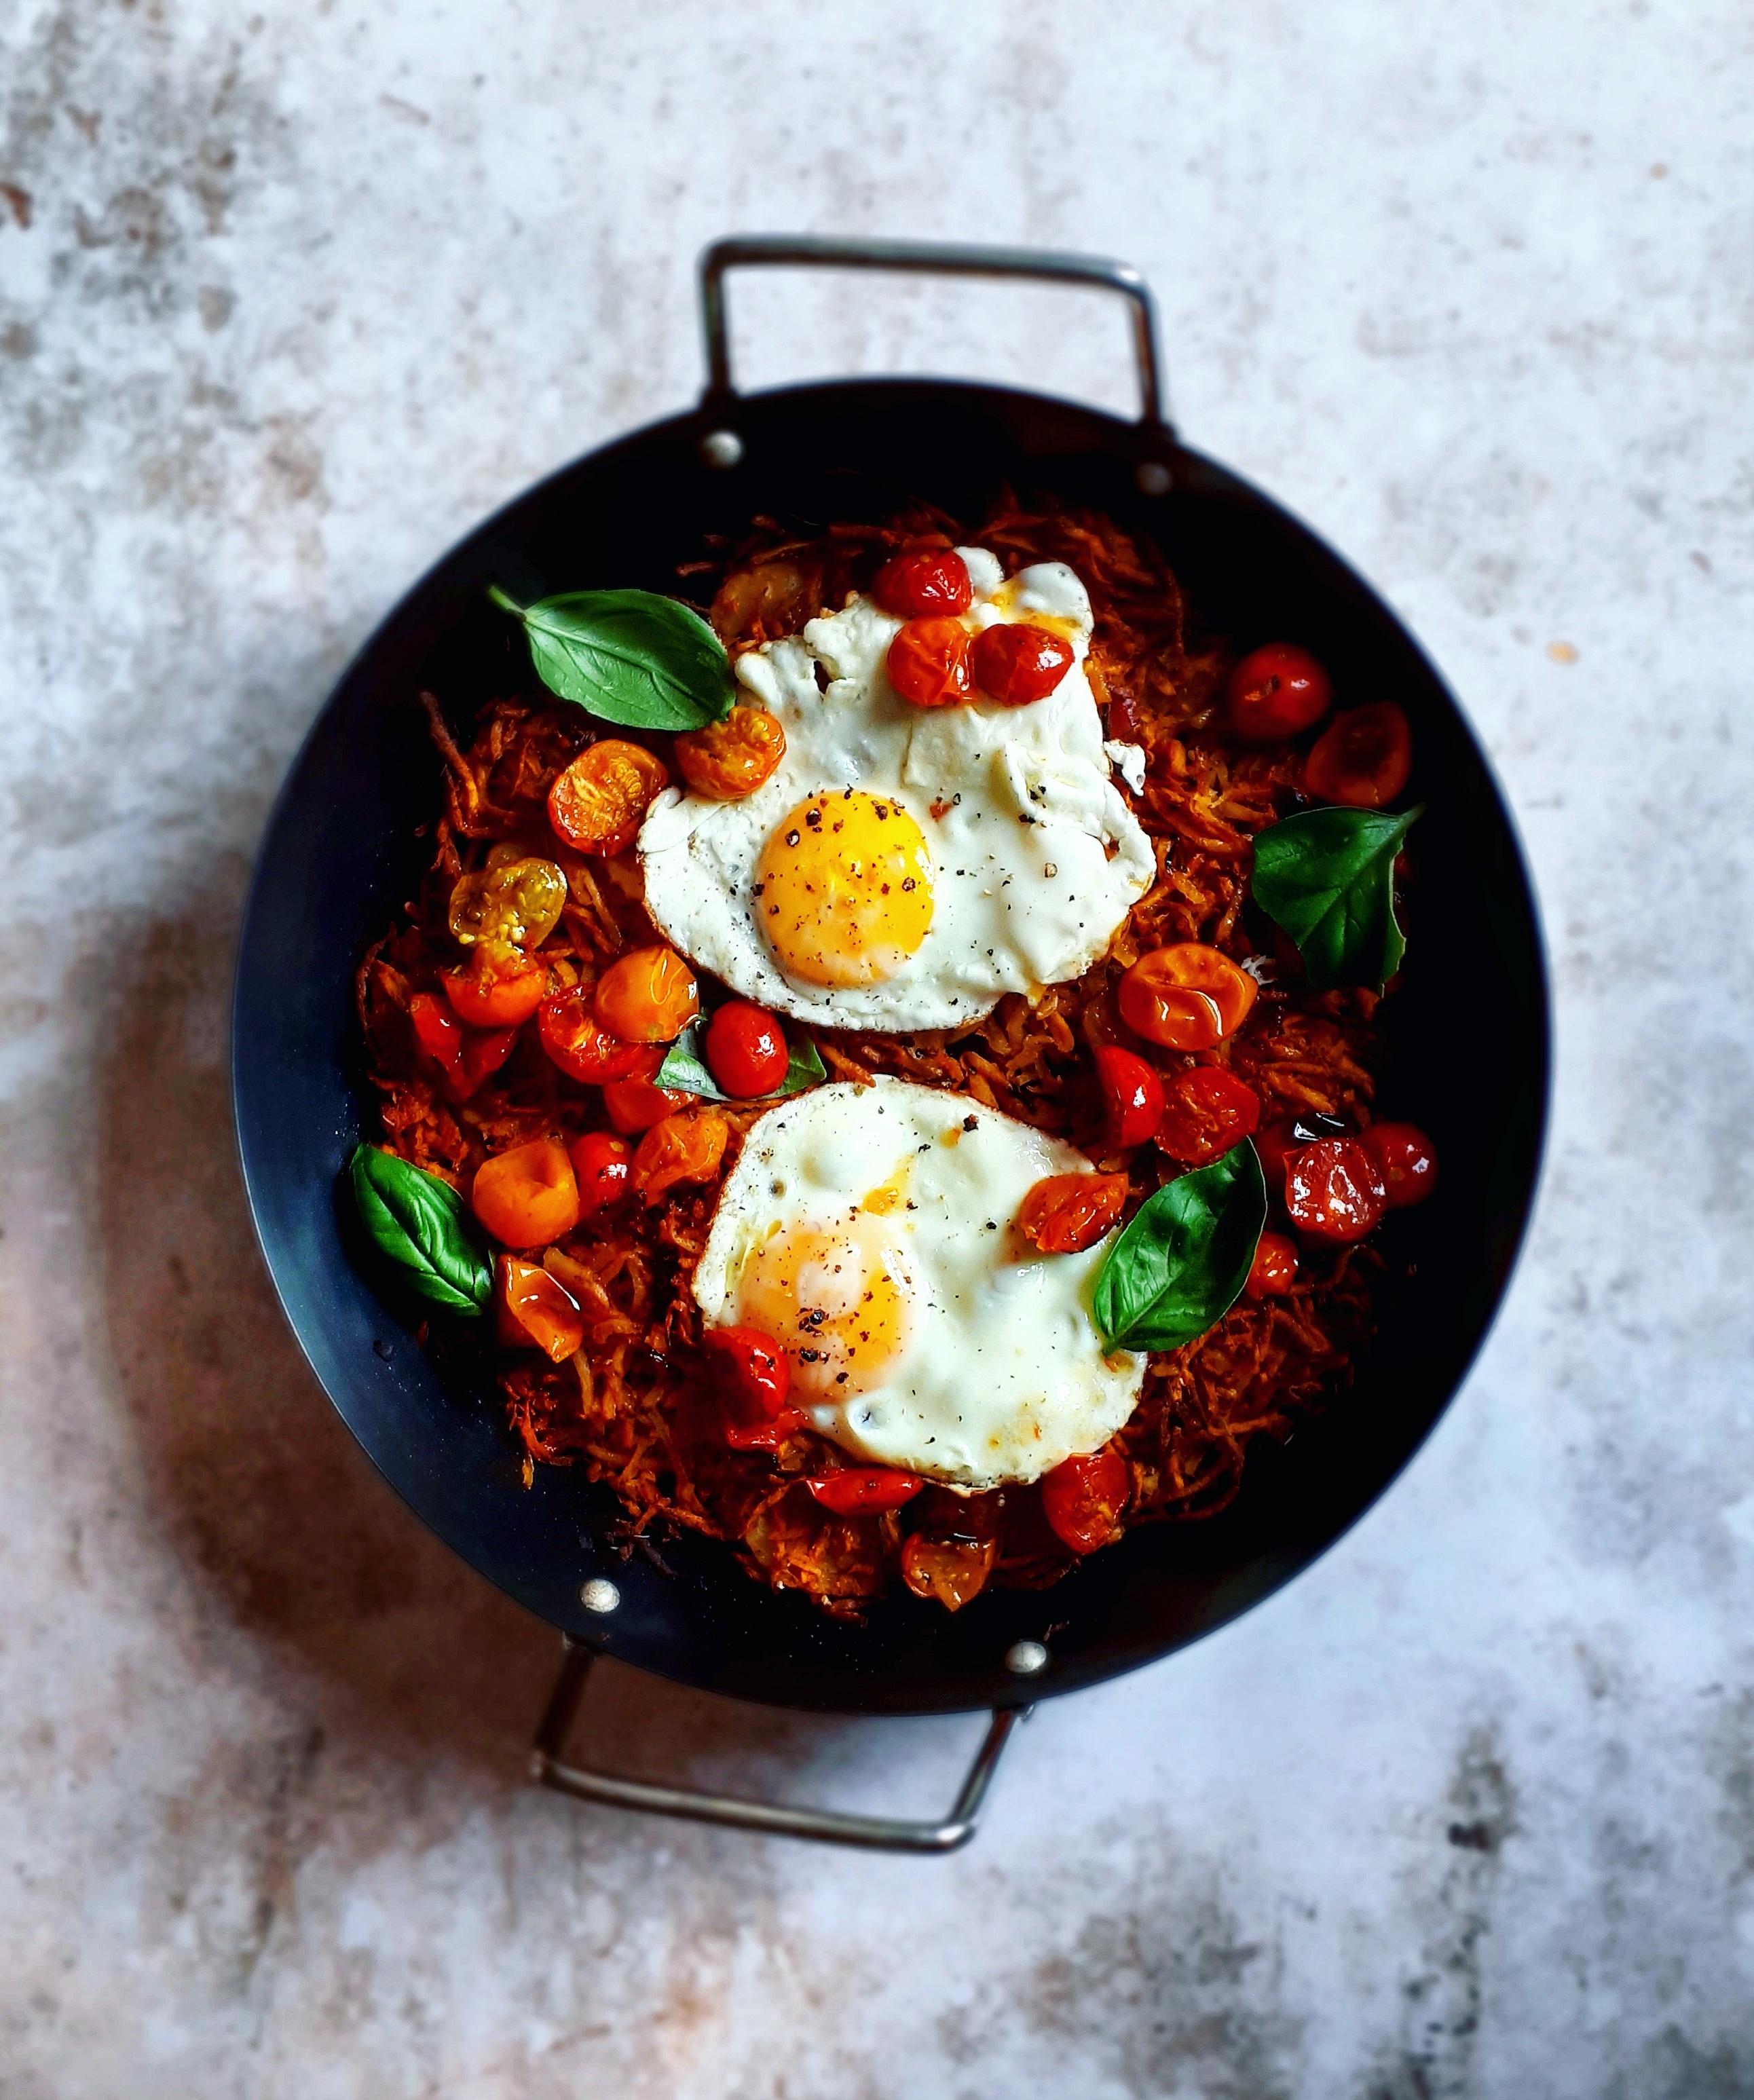 ProCook shares Anna from annaskitchentableshrewsbury oven rosti made in the ProCook Paella Pan